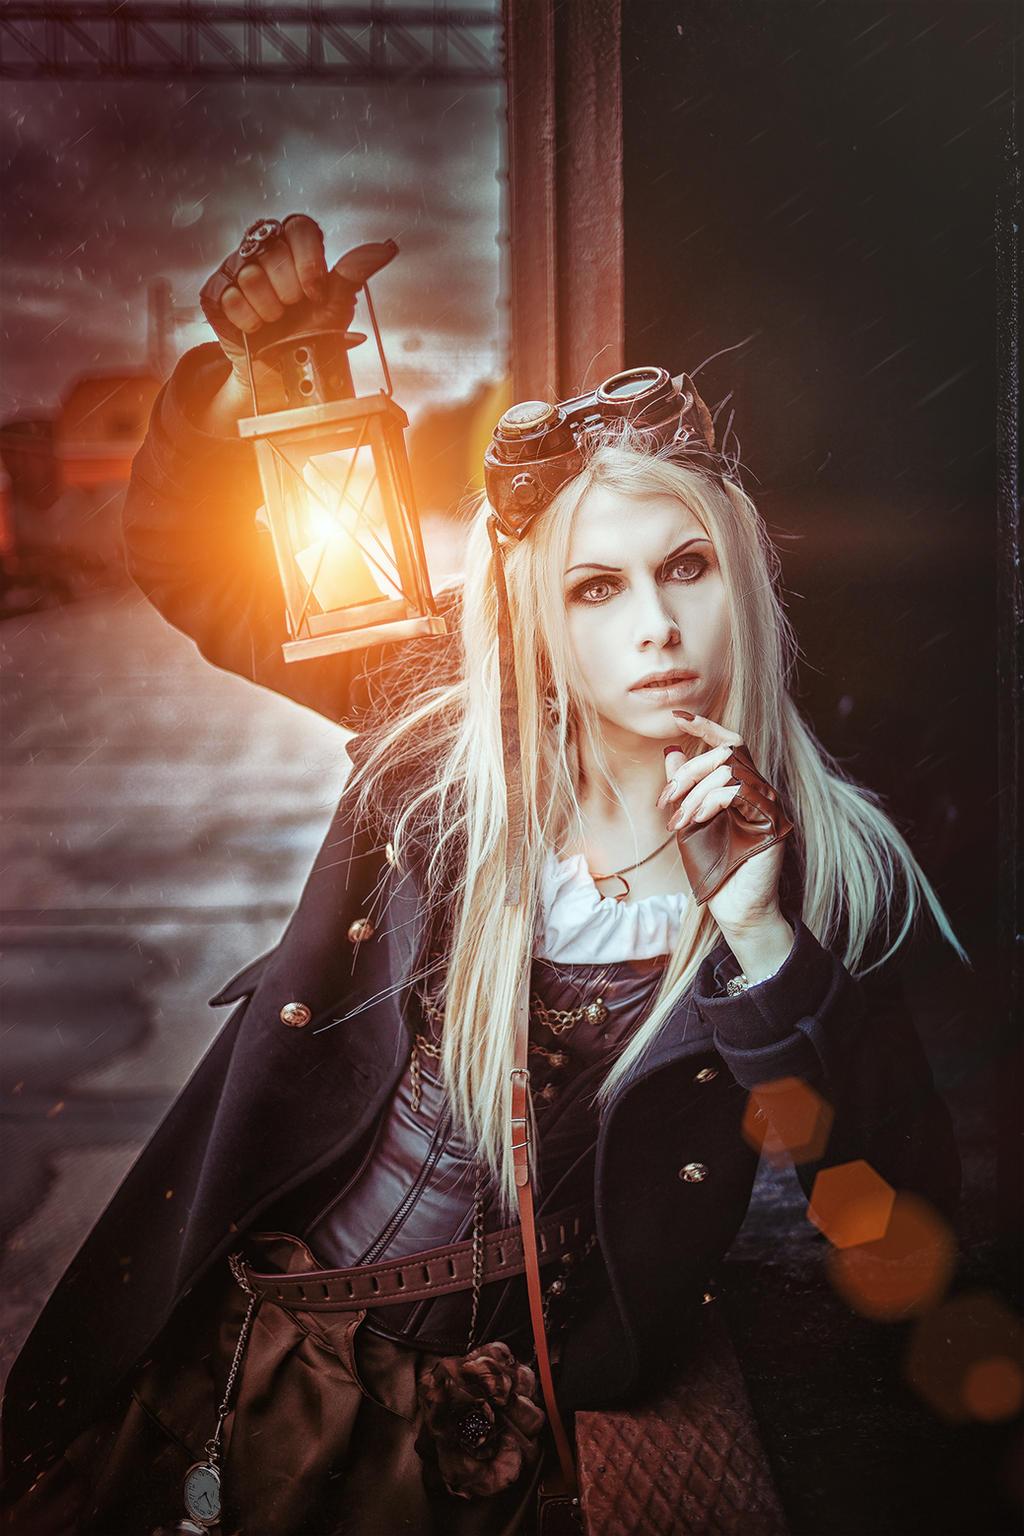 Steampunk watchman by Elena-NeriumOleander